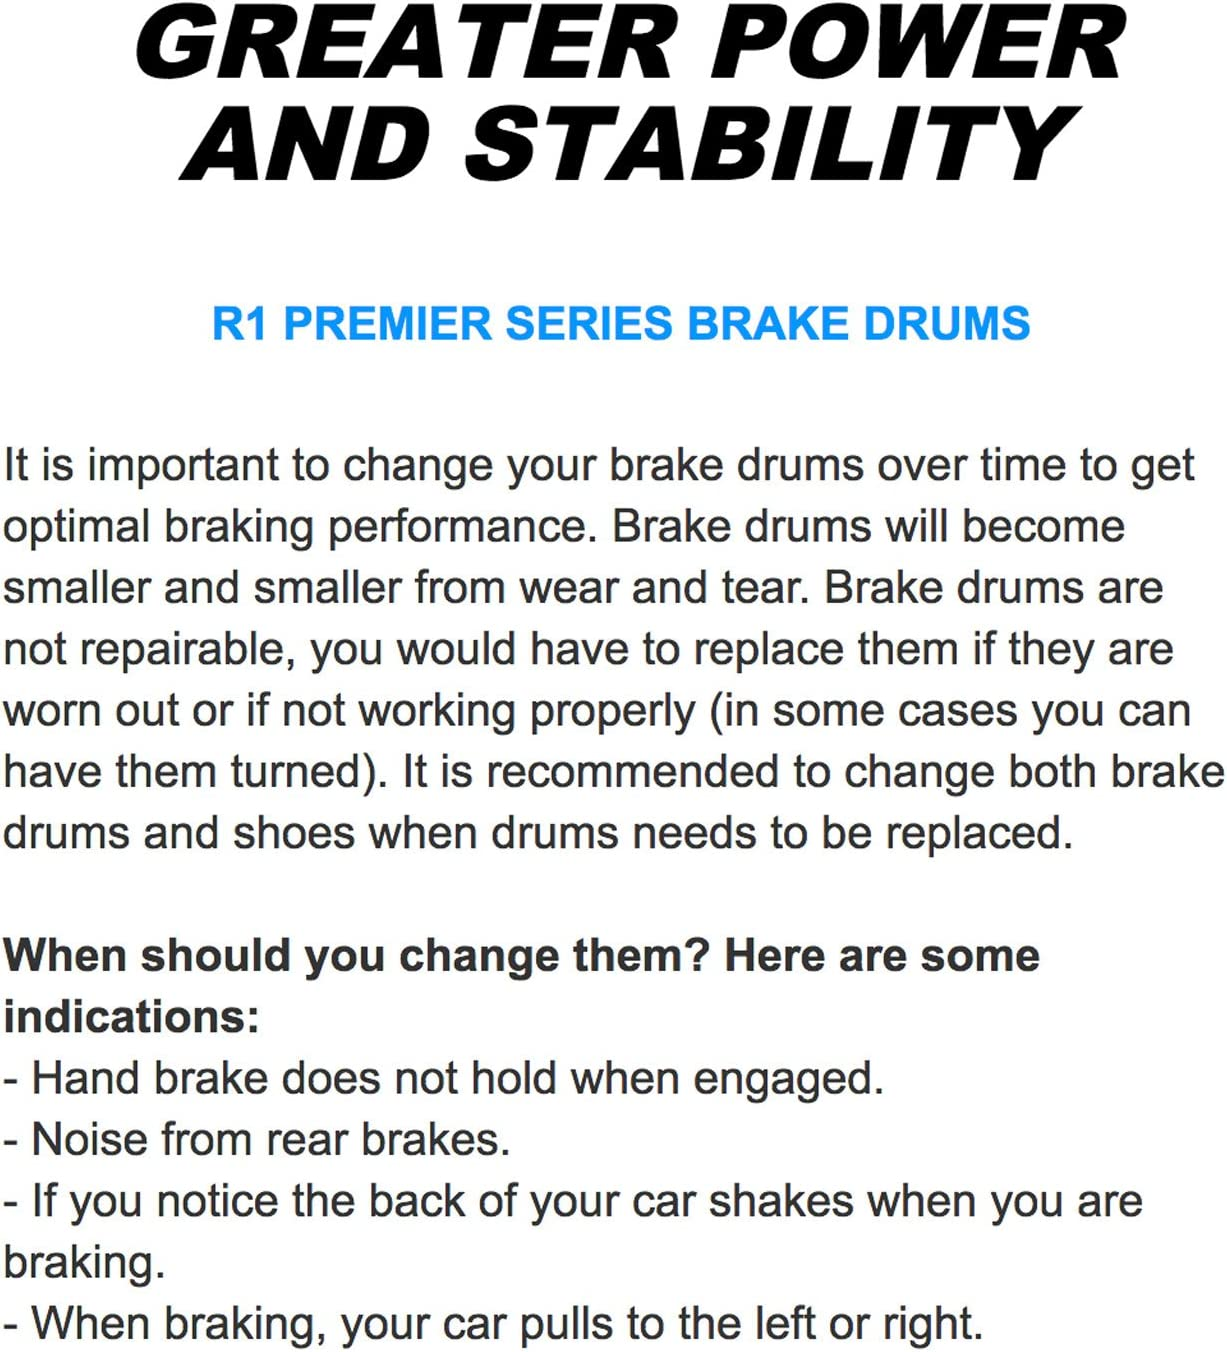 Pair DR-37003 R1 Concepts Rear Brake Drums